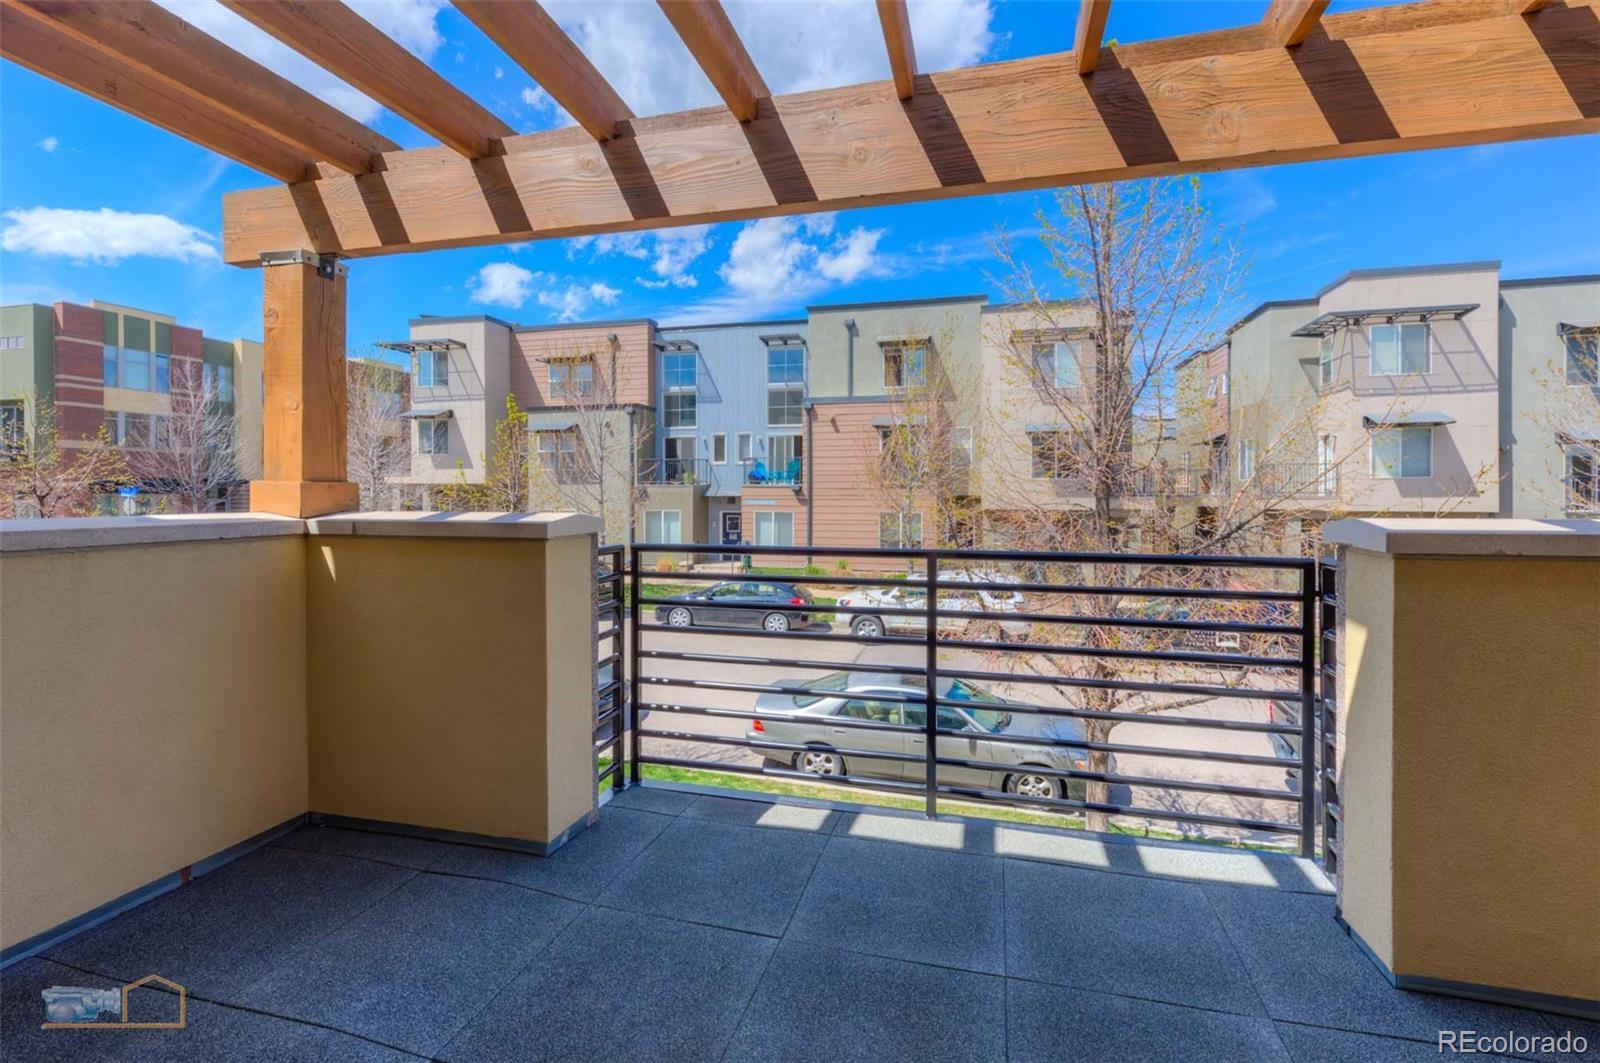 MLS# 8253378 - 4 - 1350 Rosewood Avenue, Boulder, CO 80304